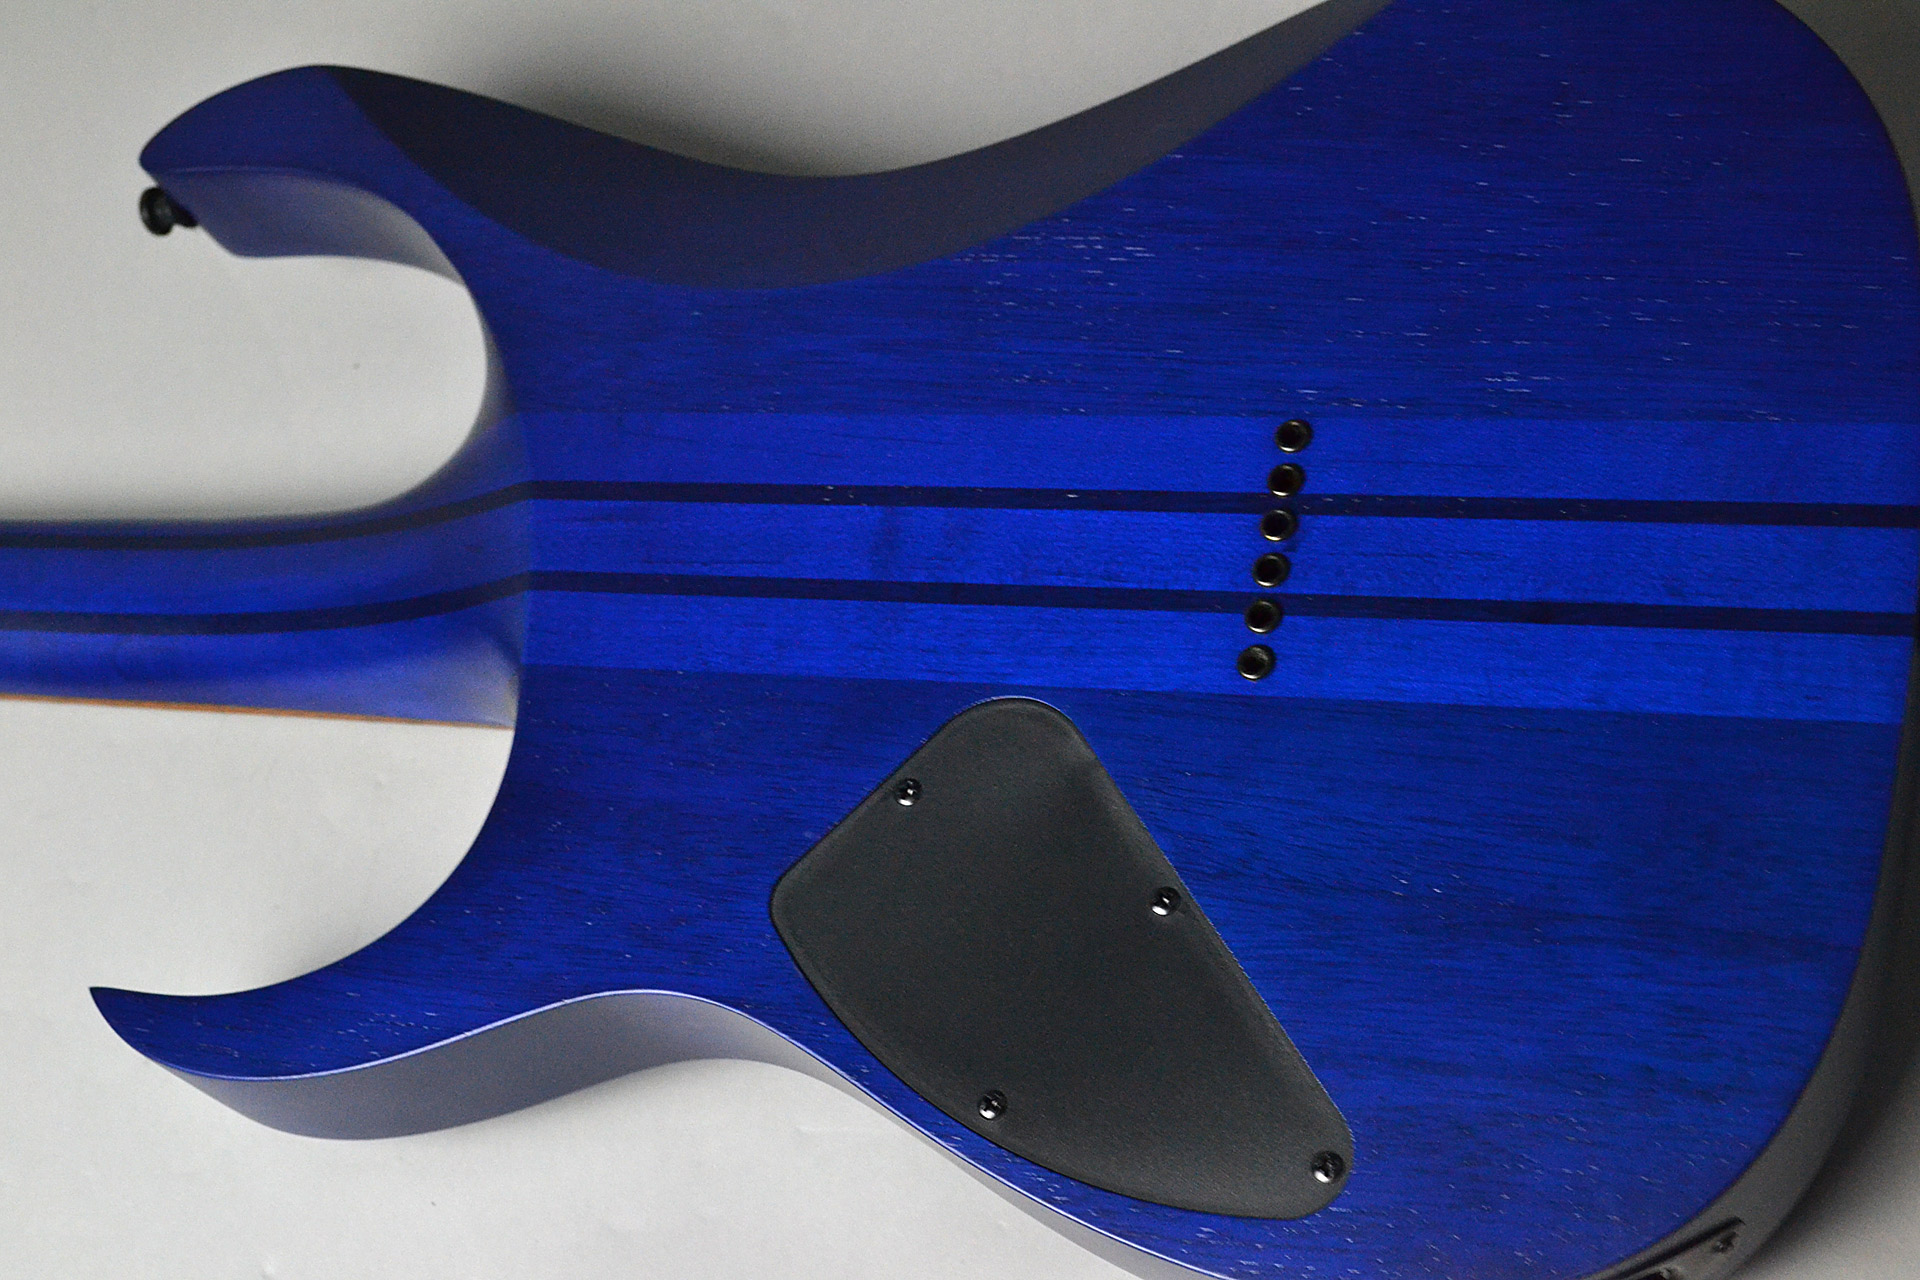 RGRT621DPB BLF Blue Lagoon Burst Flat【限定モデル】のボディバック-アップ画像